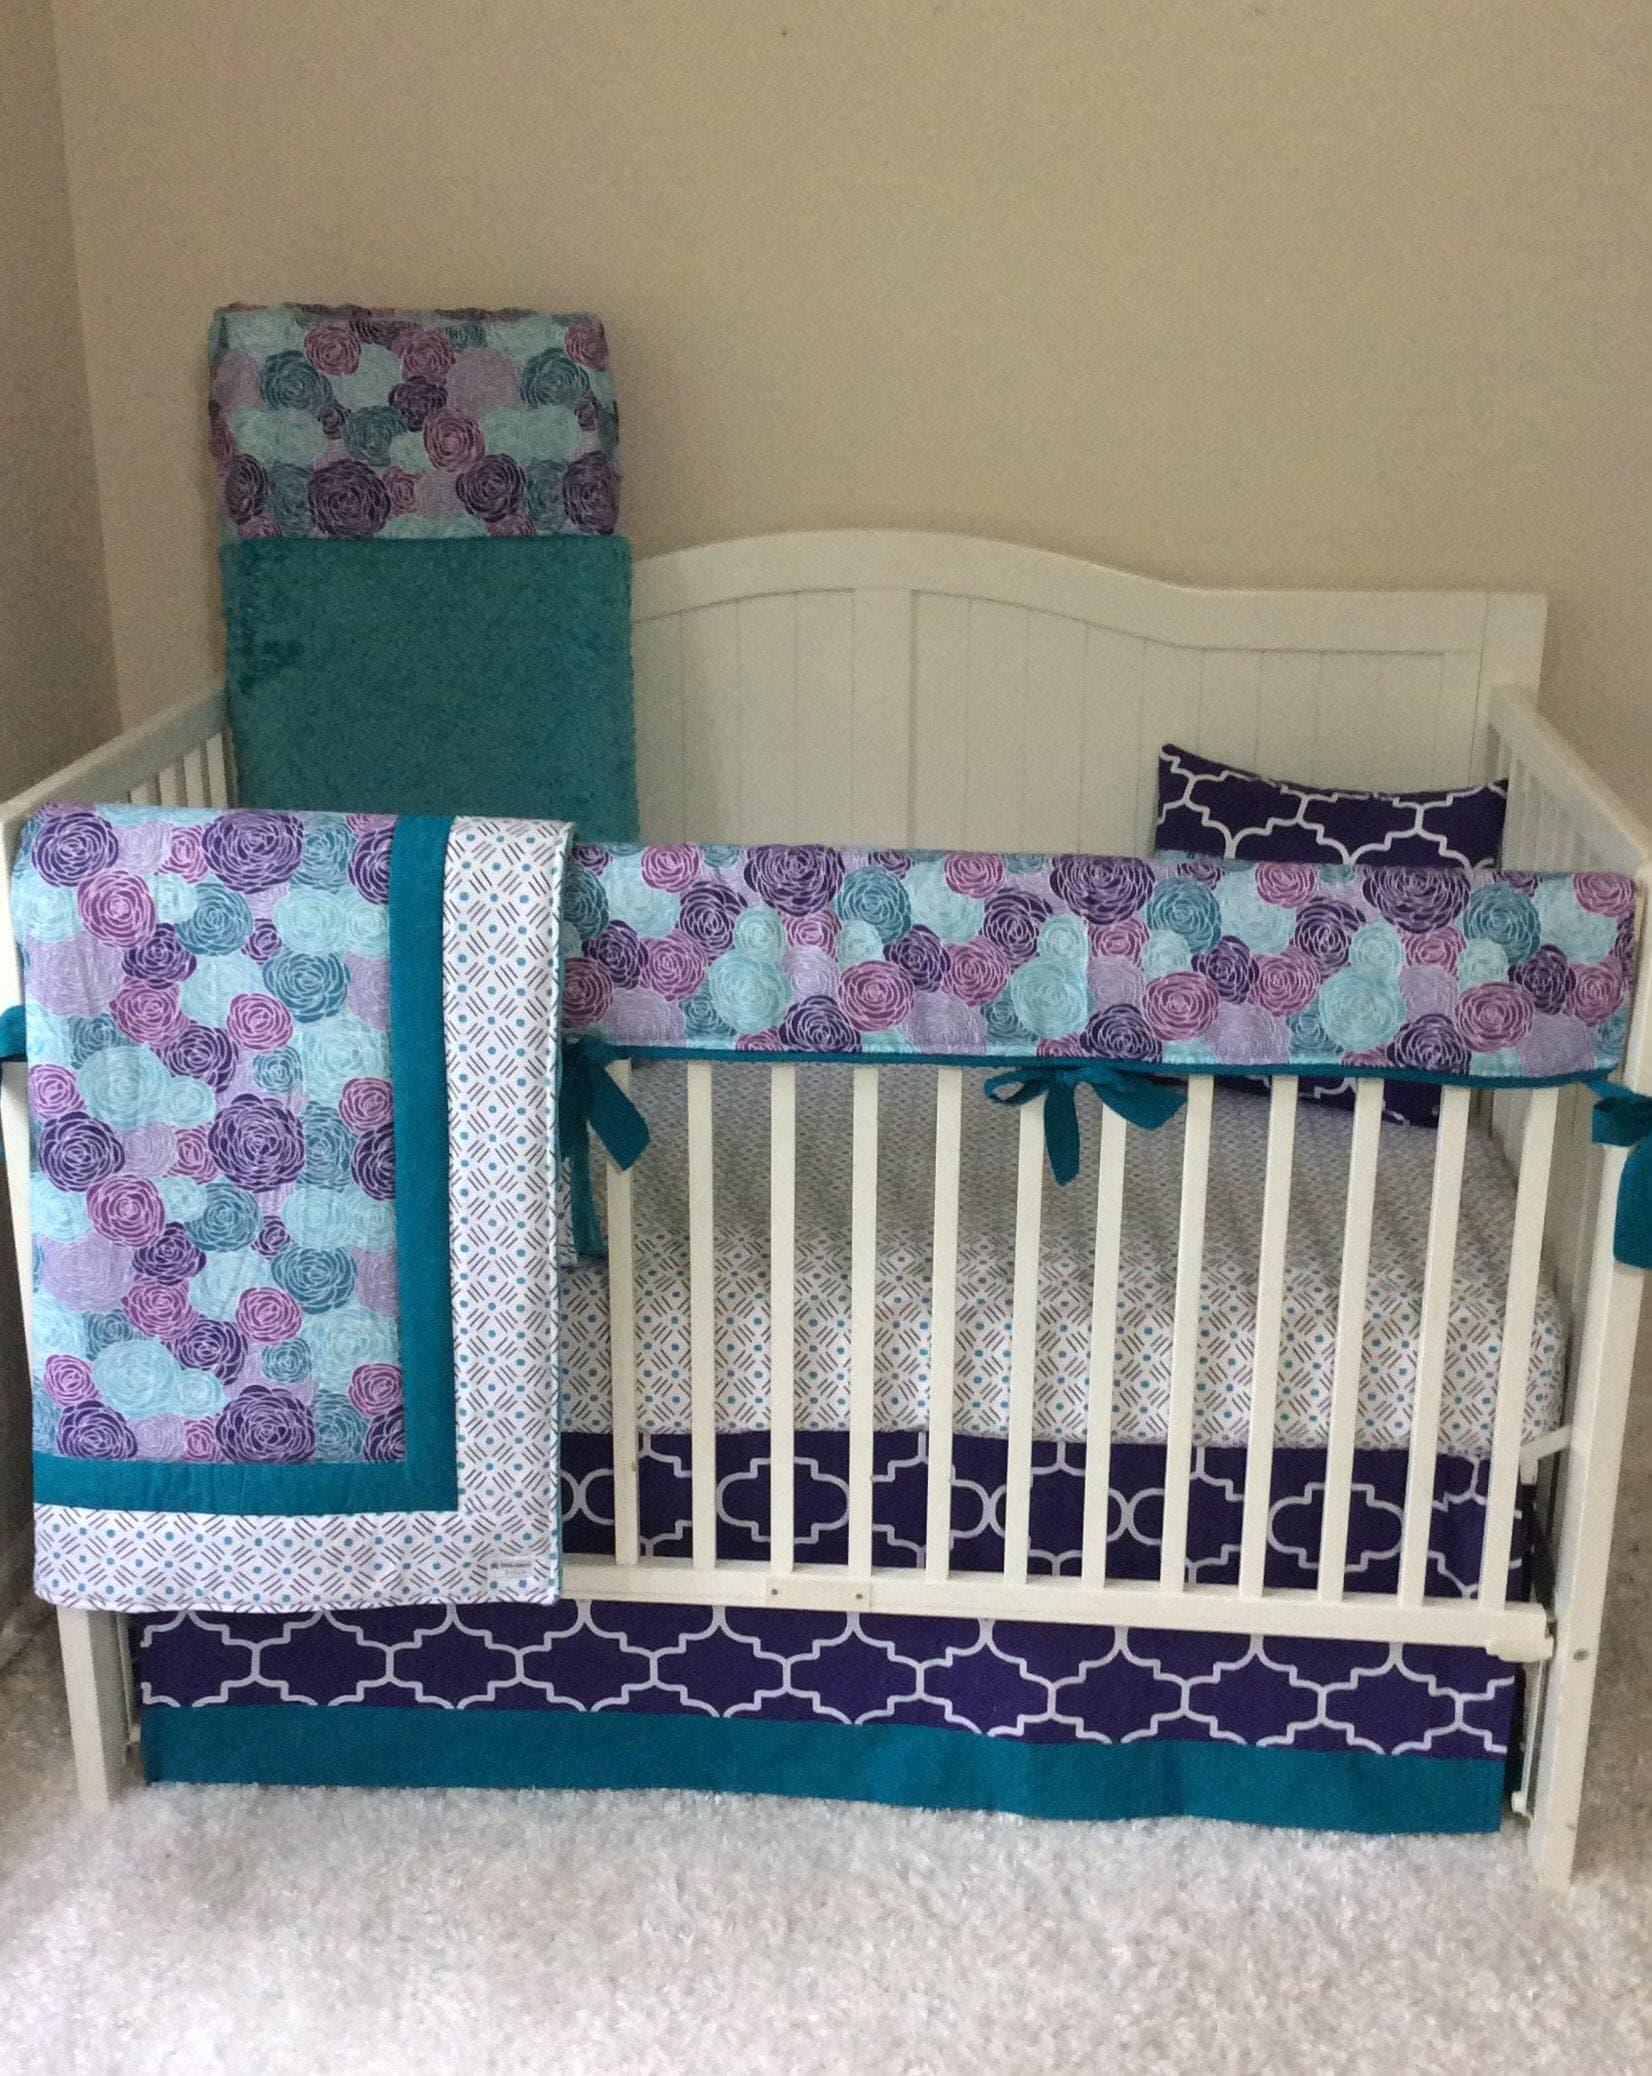 Baby Girl Crib Bedding Set Purple Teal Modern Floral